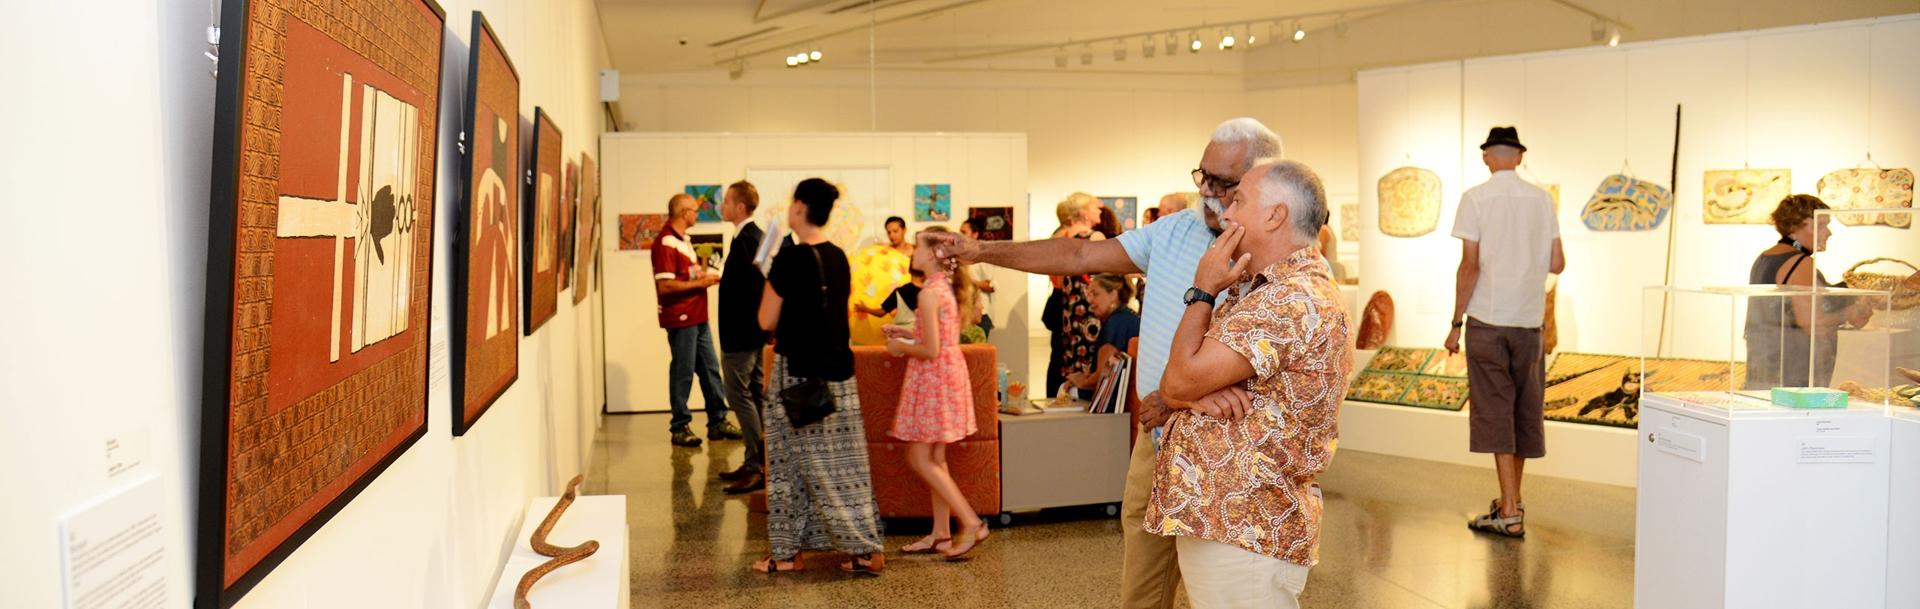 Hervey Bay Regional Gallery photo